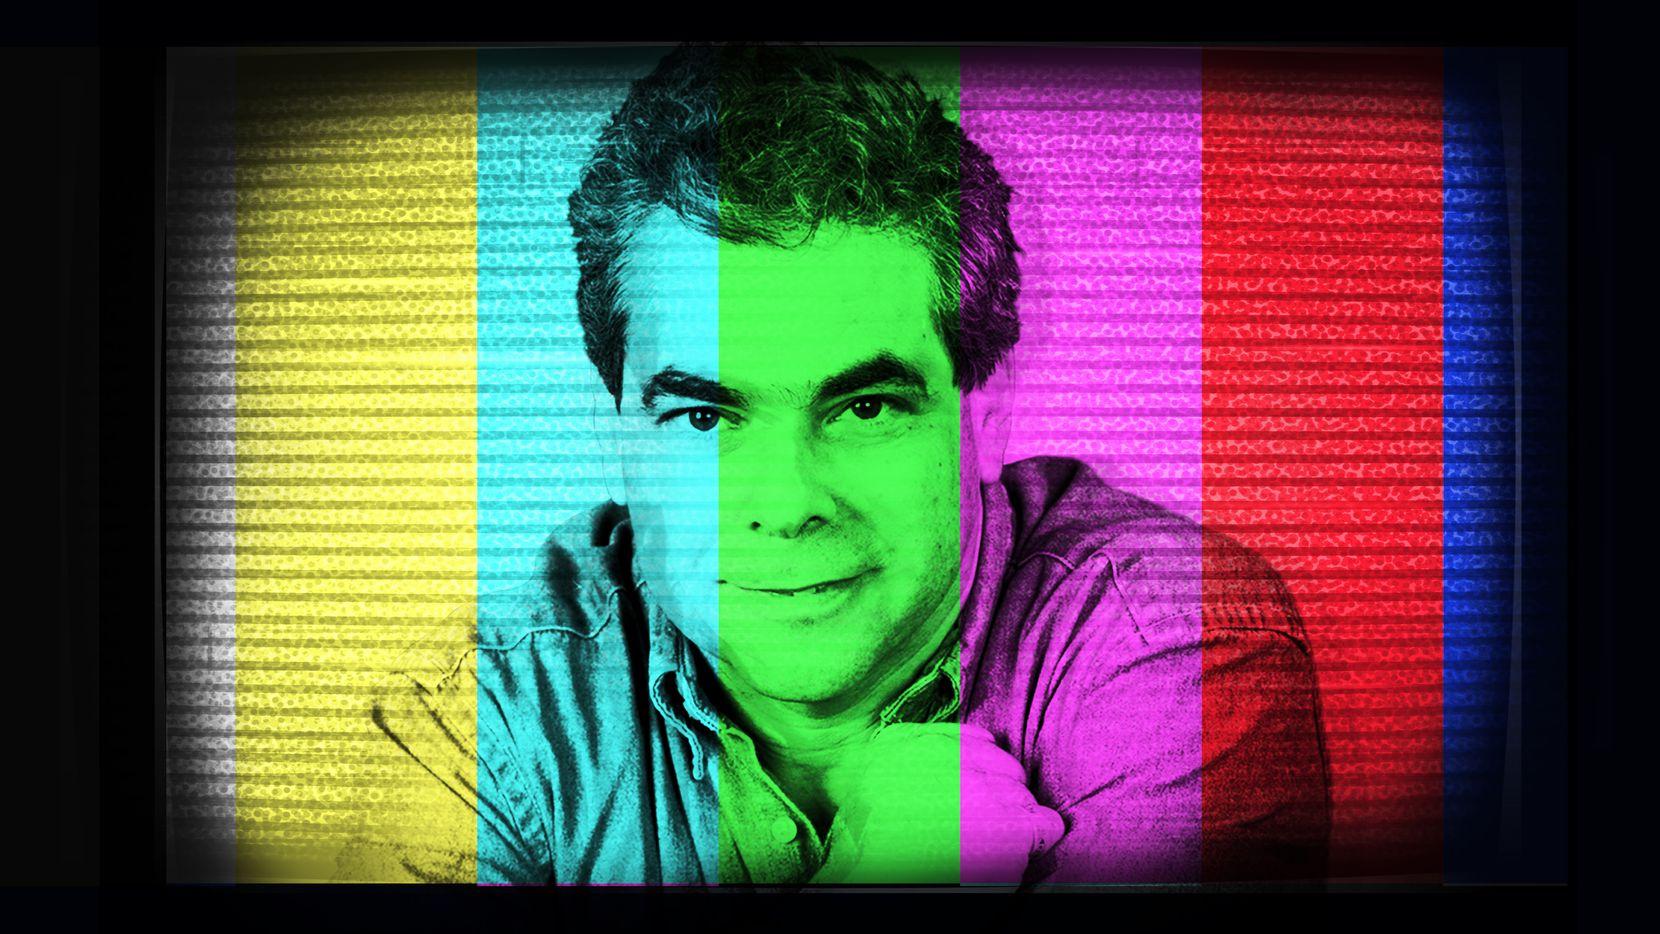 Dallas Video Fest founder Bart Weiss